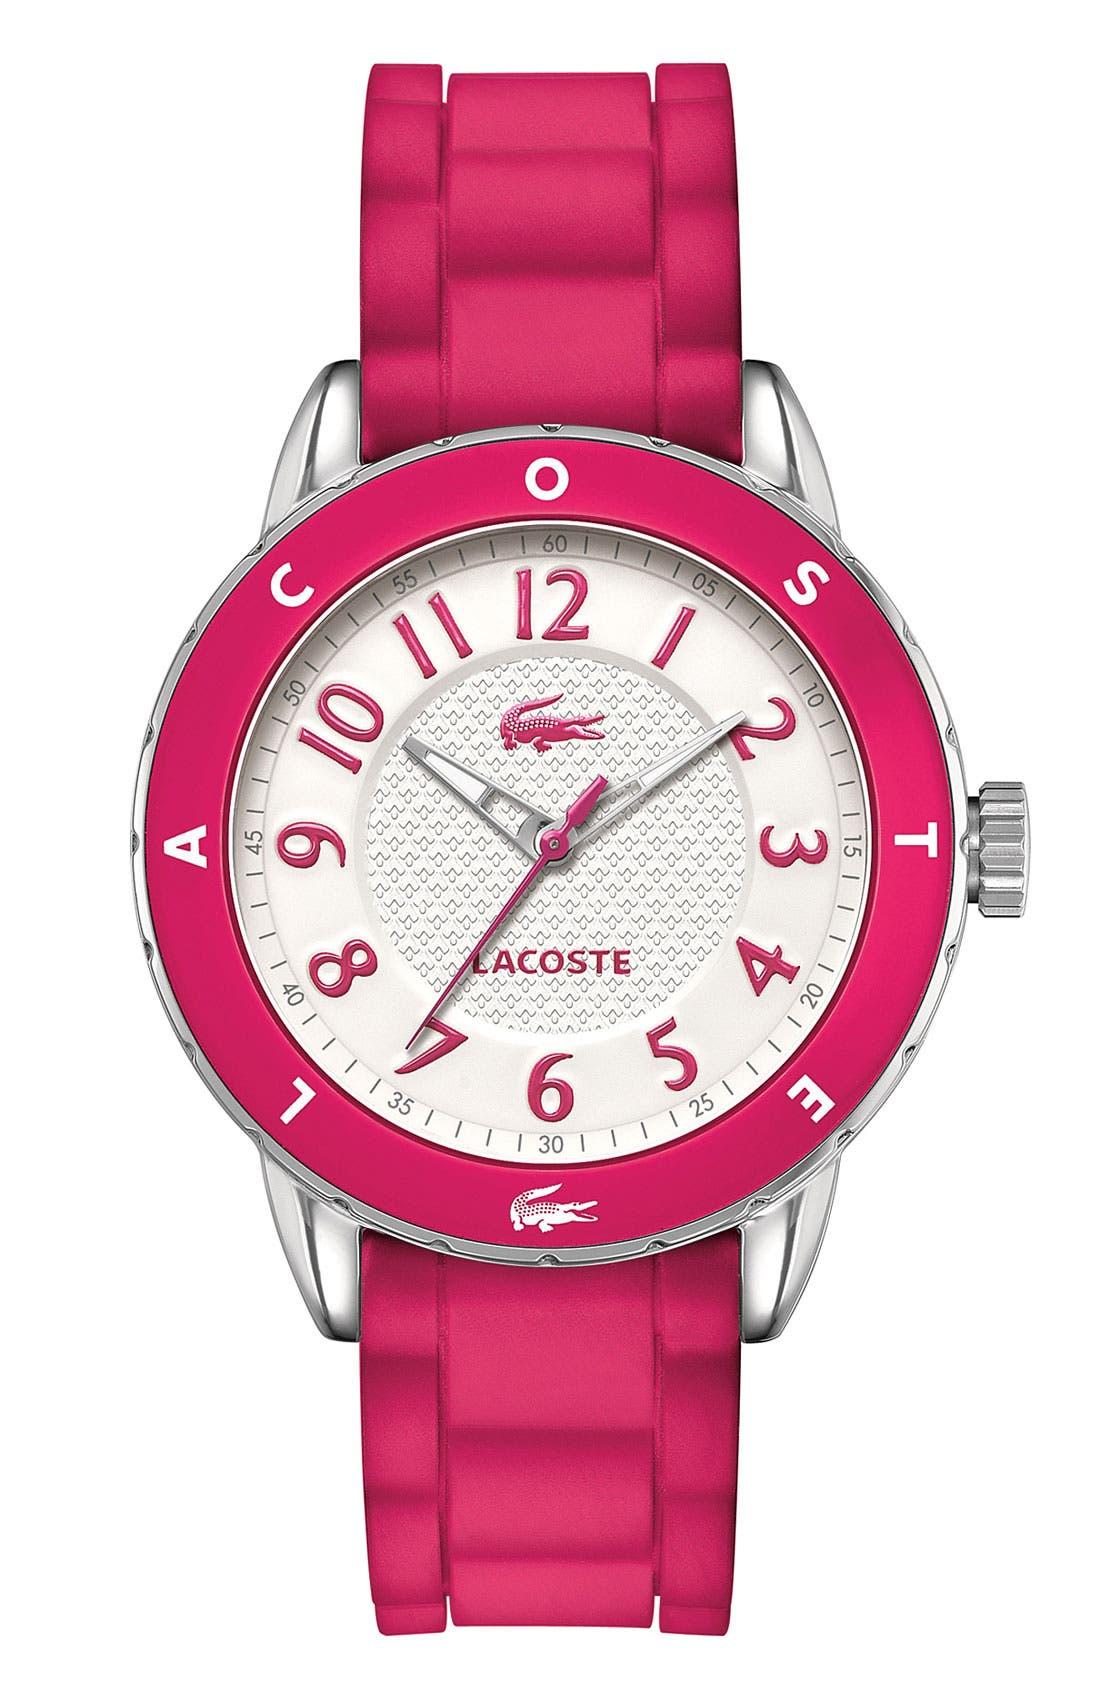 Main Image - Lacoste 'Rio' Silicone Strap Watch, 40mm